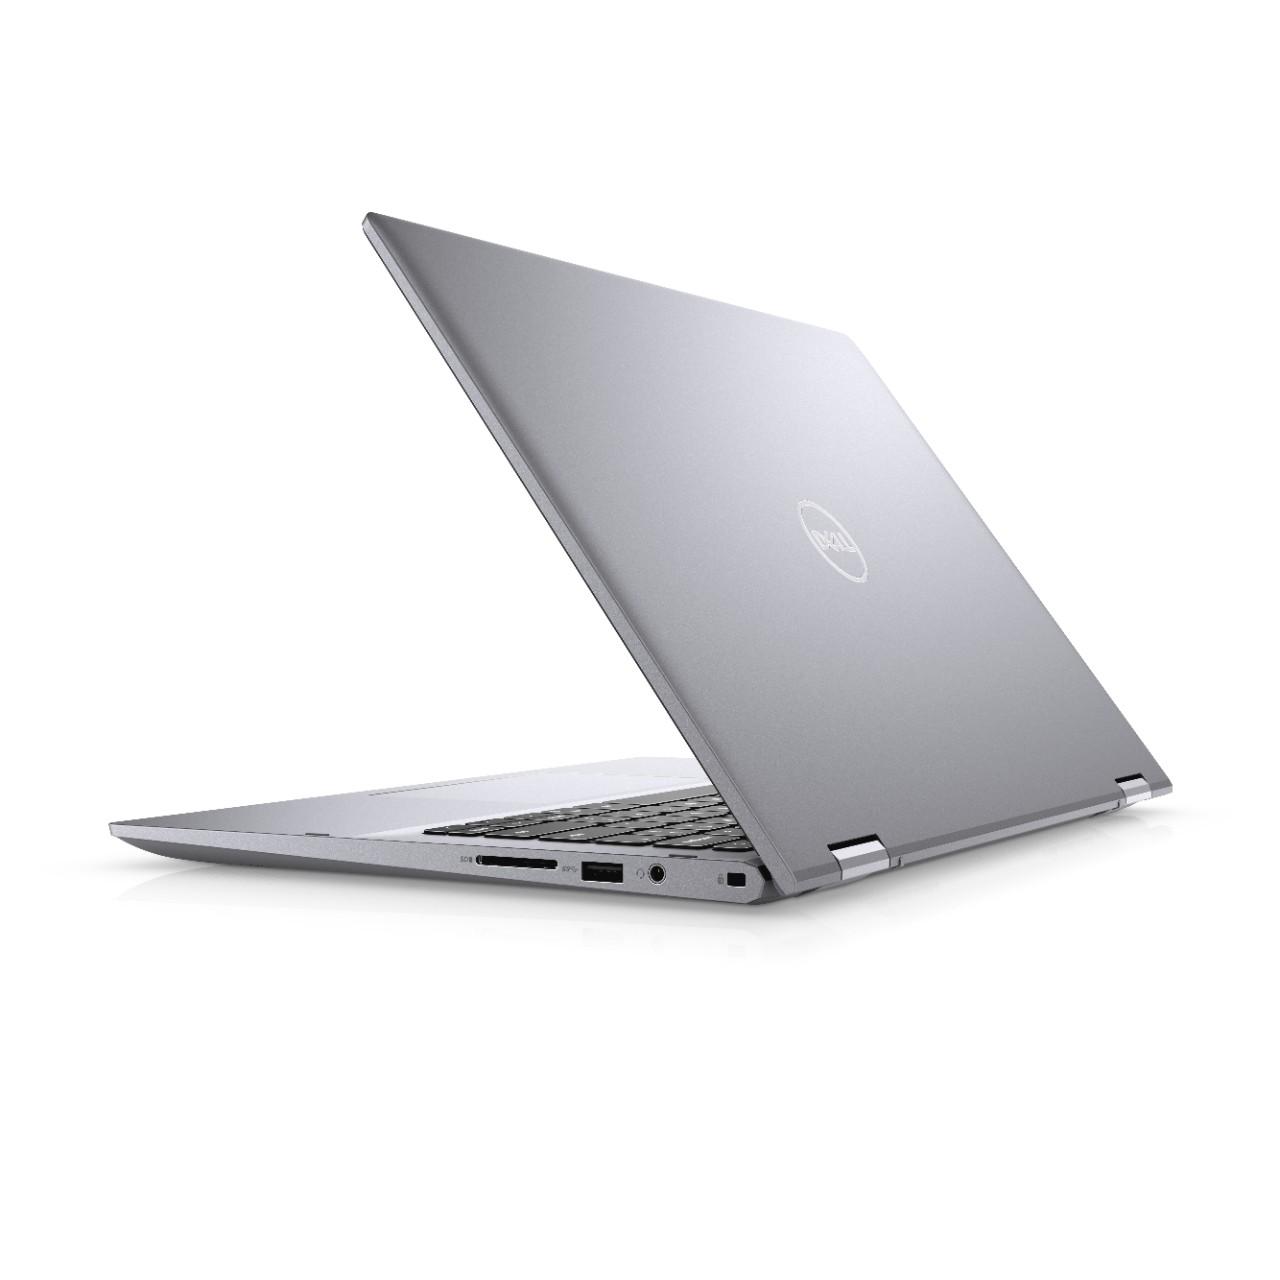 Dell Inspiron 5406 14'' FHD 2v1 Touch i7-1165G7/16GB/1TB-SSD/FPR/HDMI/USB-C/W10Home/2RNBD/Stříbrný - TN-5406-N2-714S